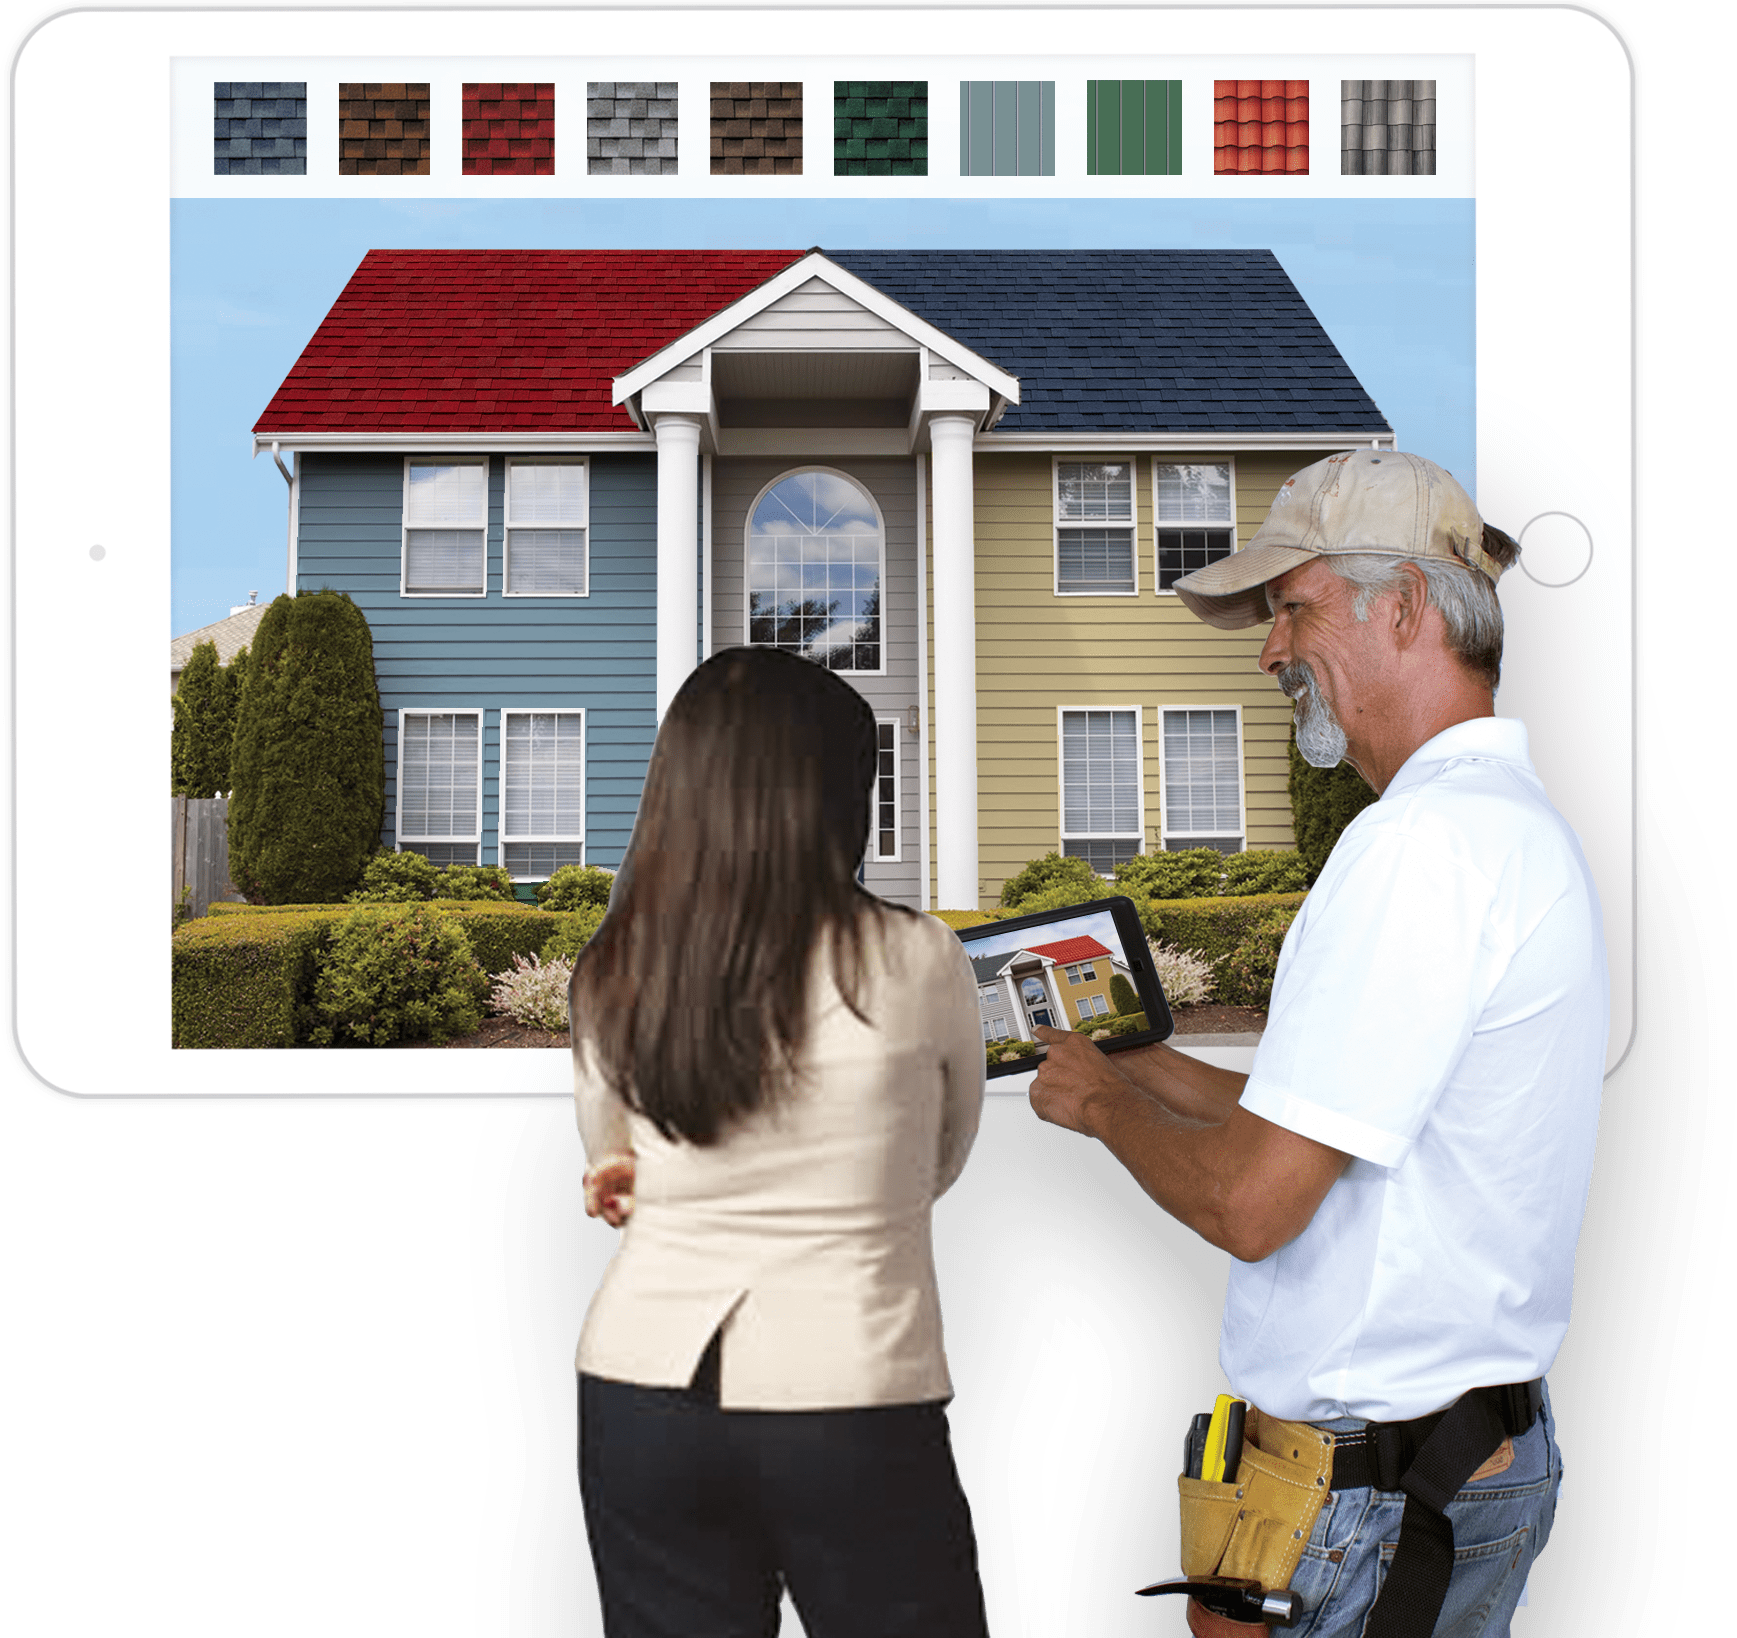 roof visualizer app